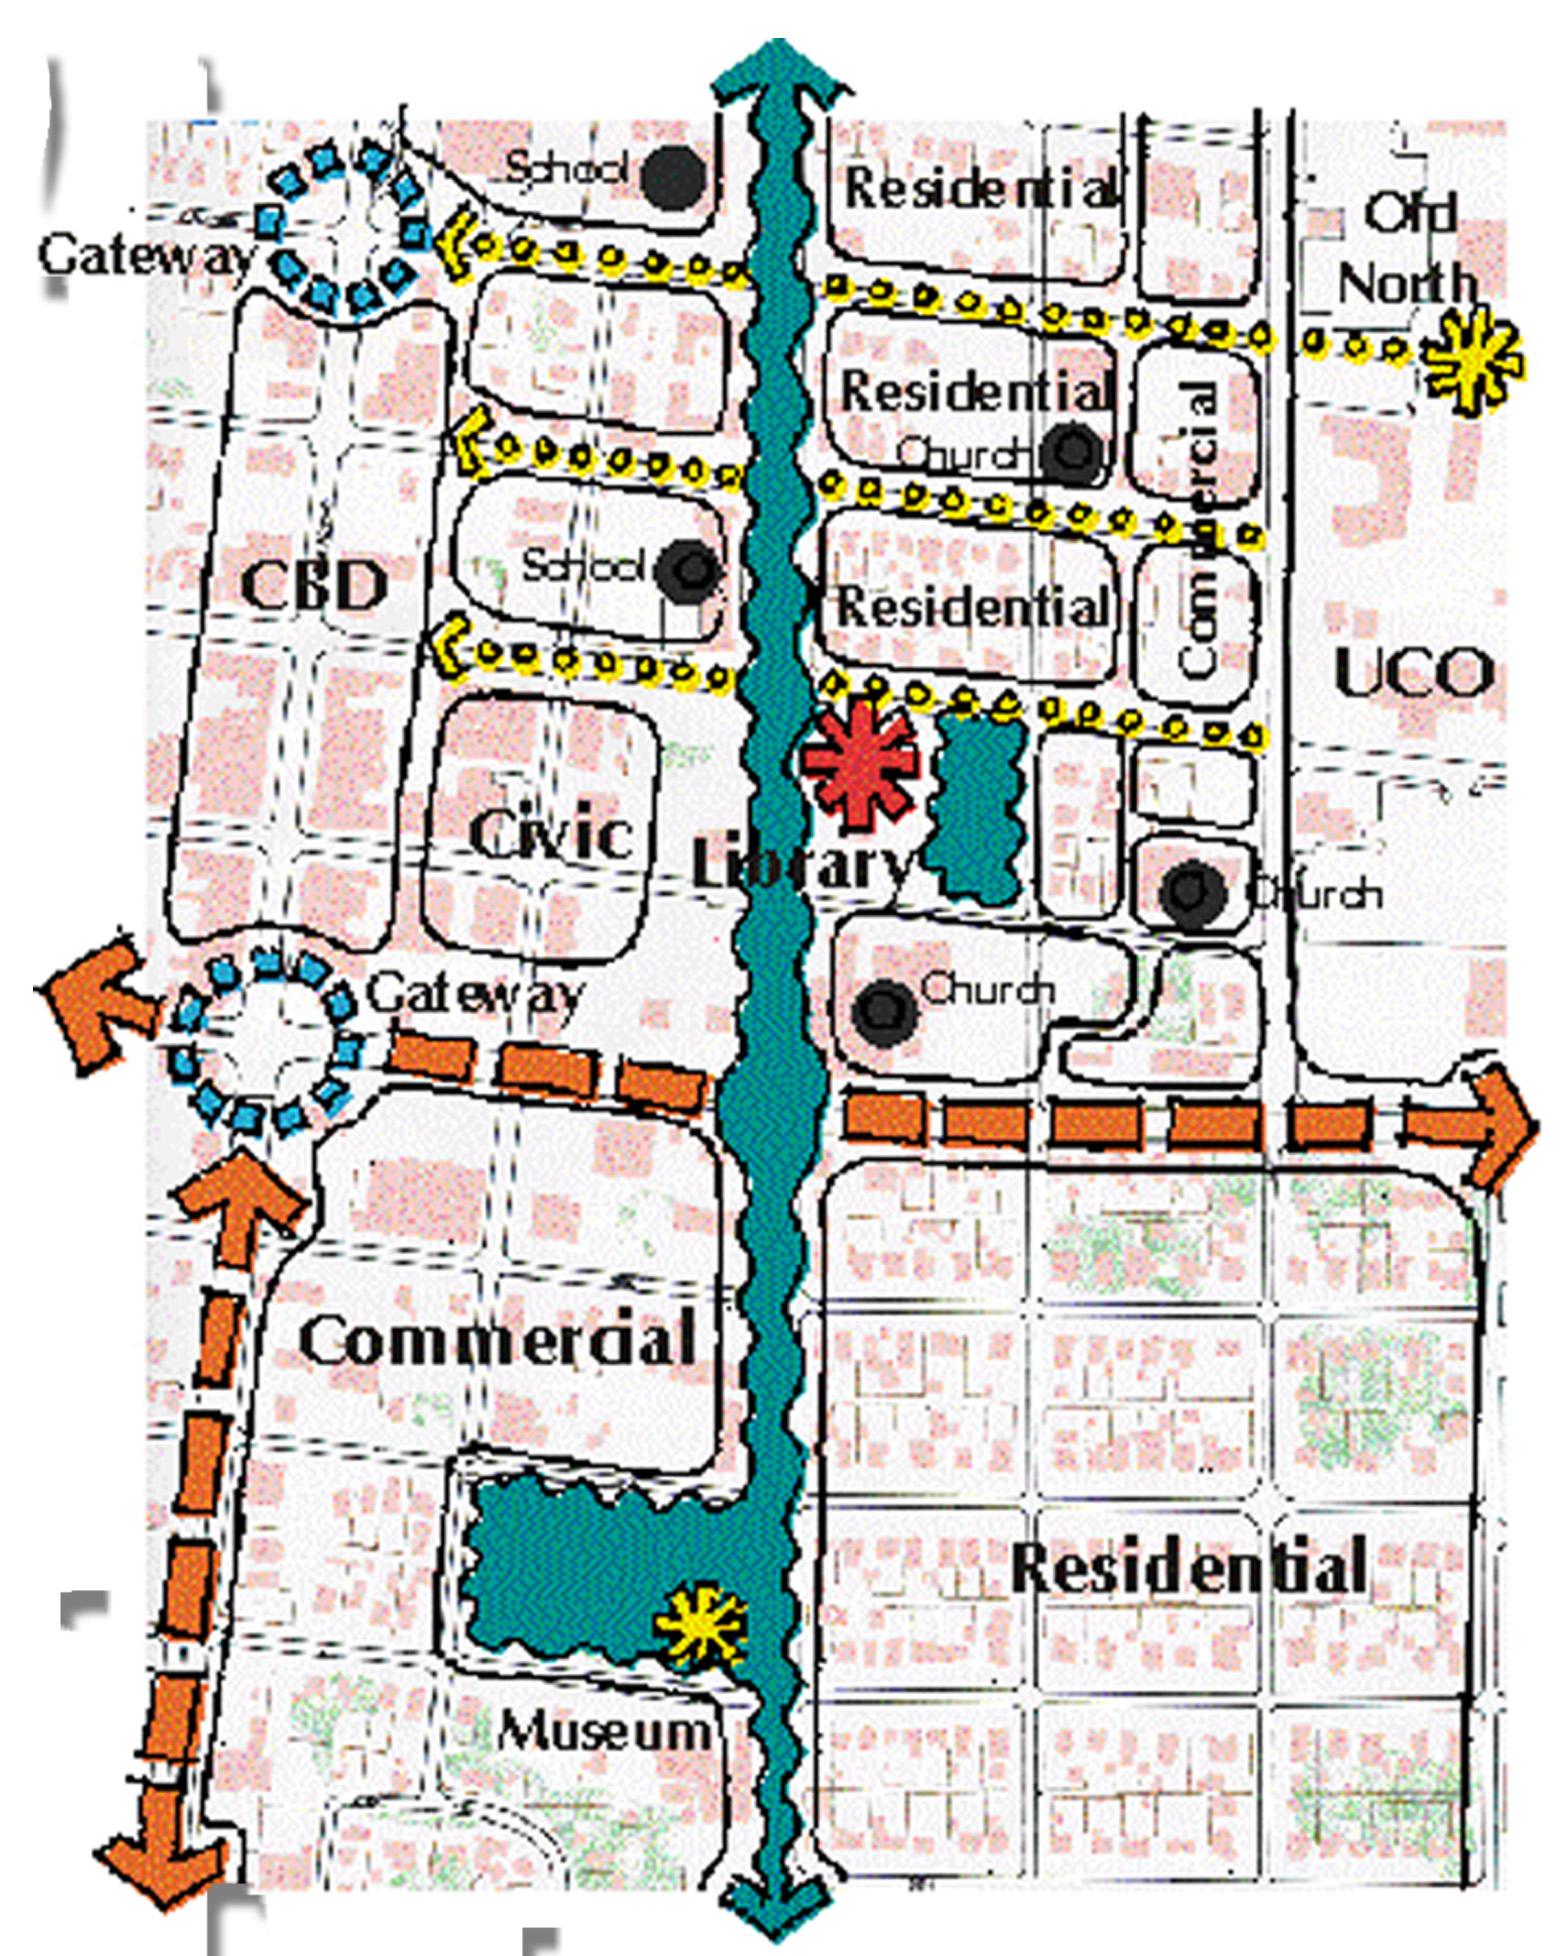 Edmond Downtown Master Plan copy.jpg